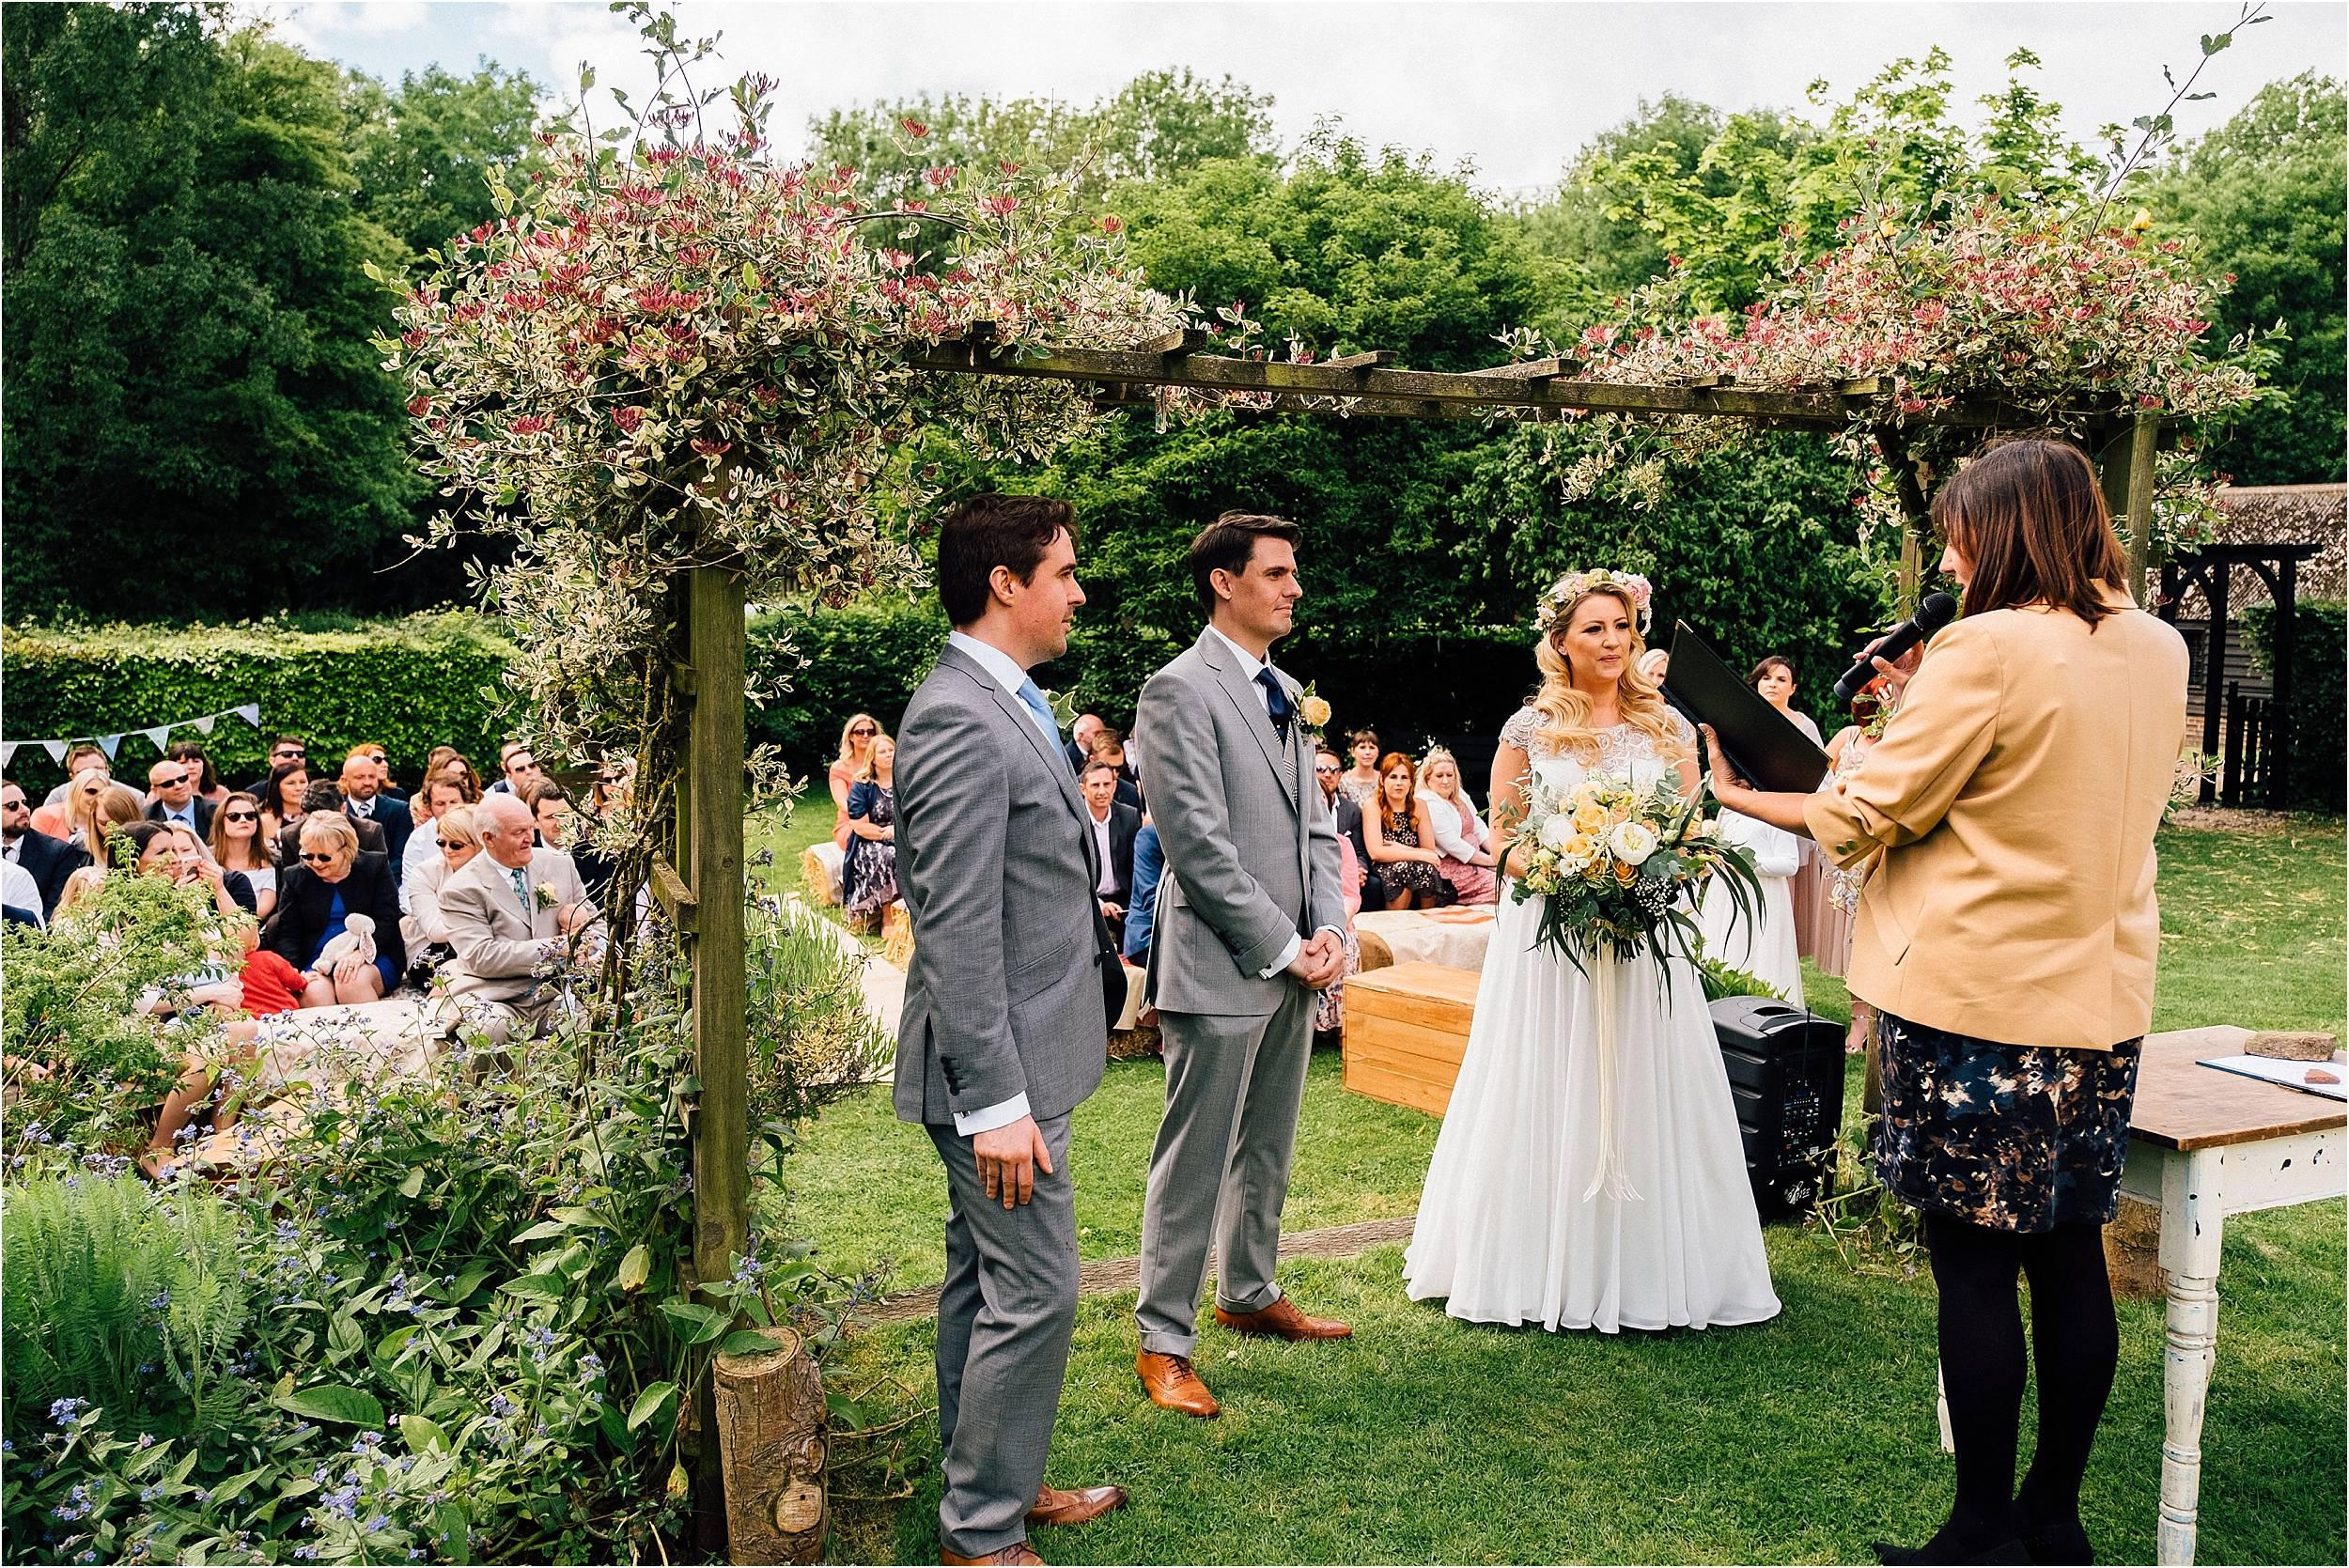 Surrey Hookhouse Farm Wedding Photographer_0046.jpg